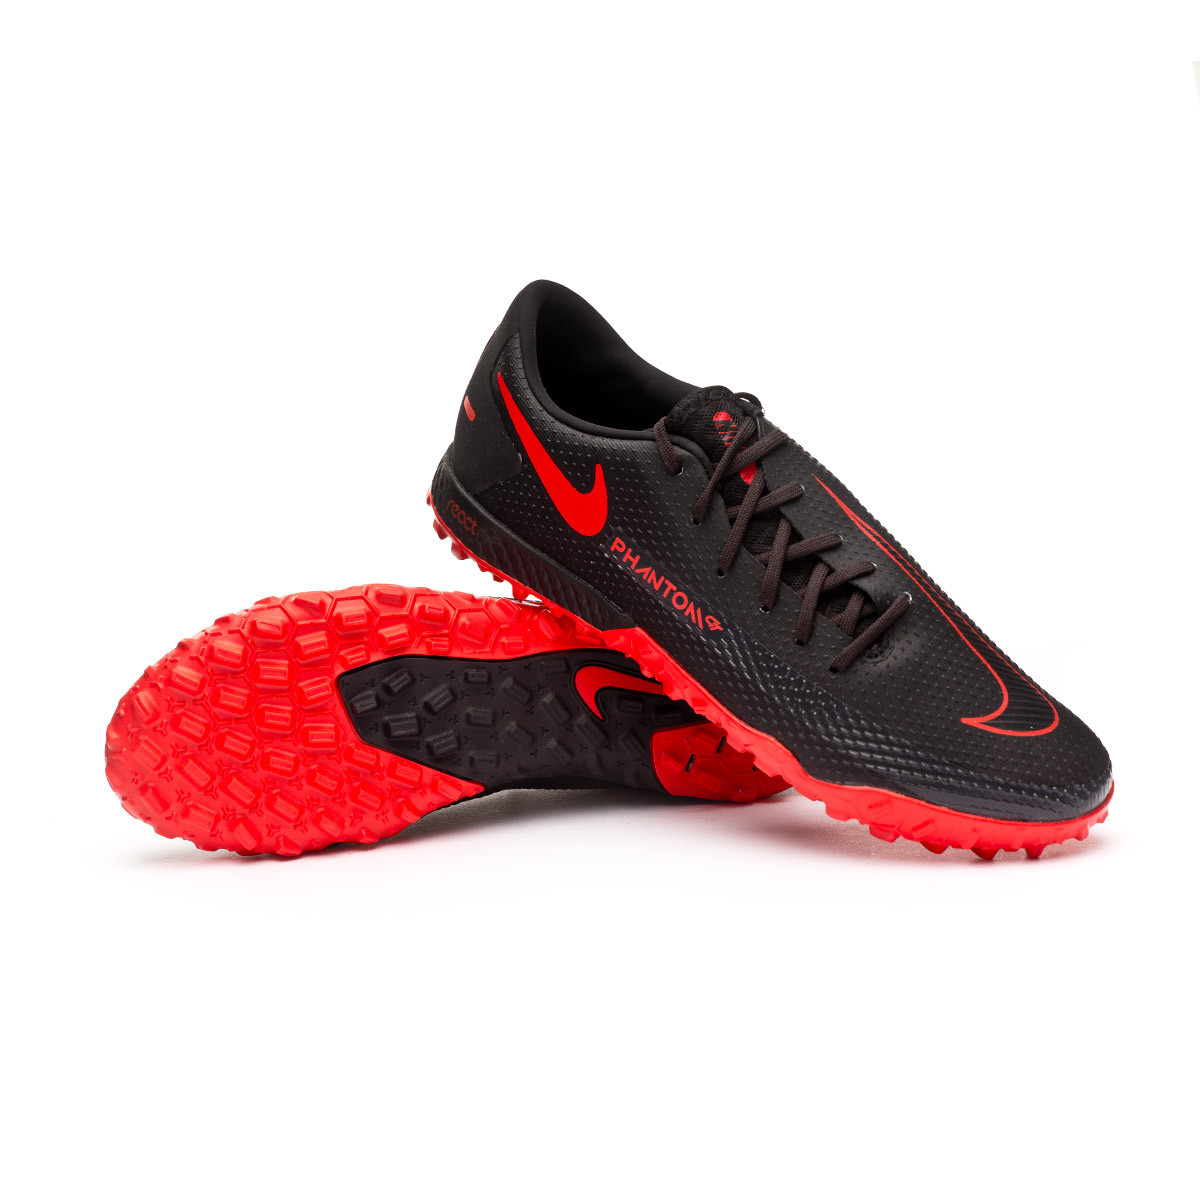 Primitivo colisión cilindro  Football Boots Nike React Phantom GT Pro Turf Black-Chile red-Dark smoke  grey - Football store Fútbol Emotion